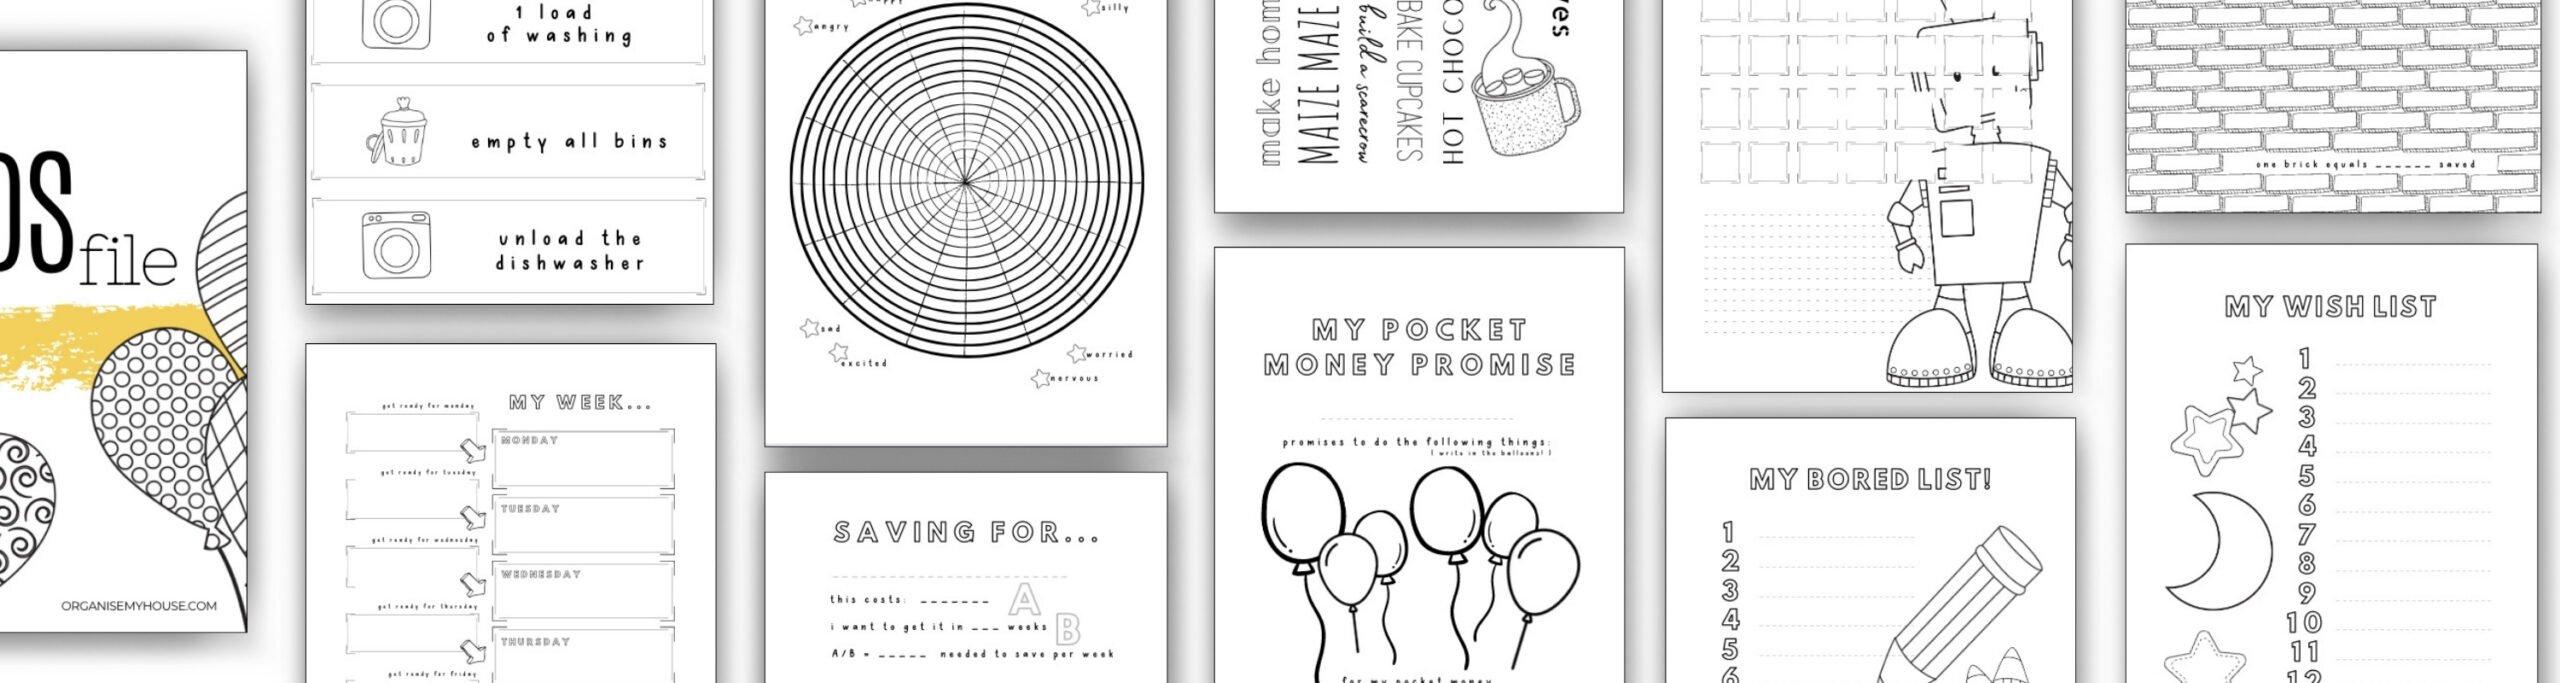 Kids file - printable pages 1